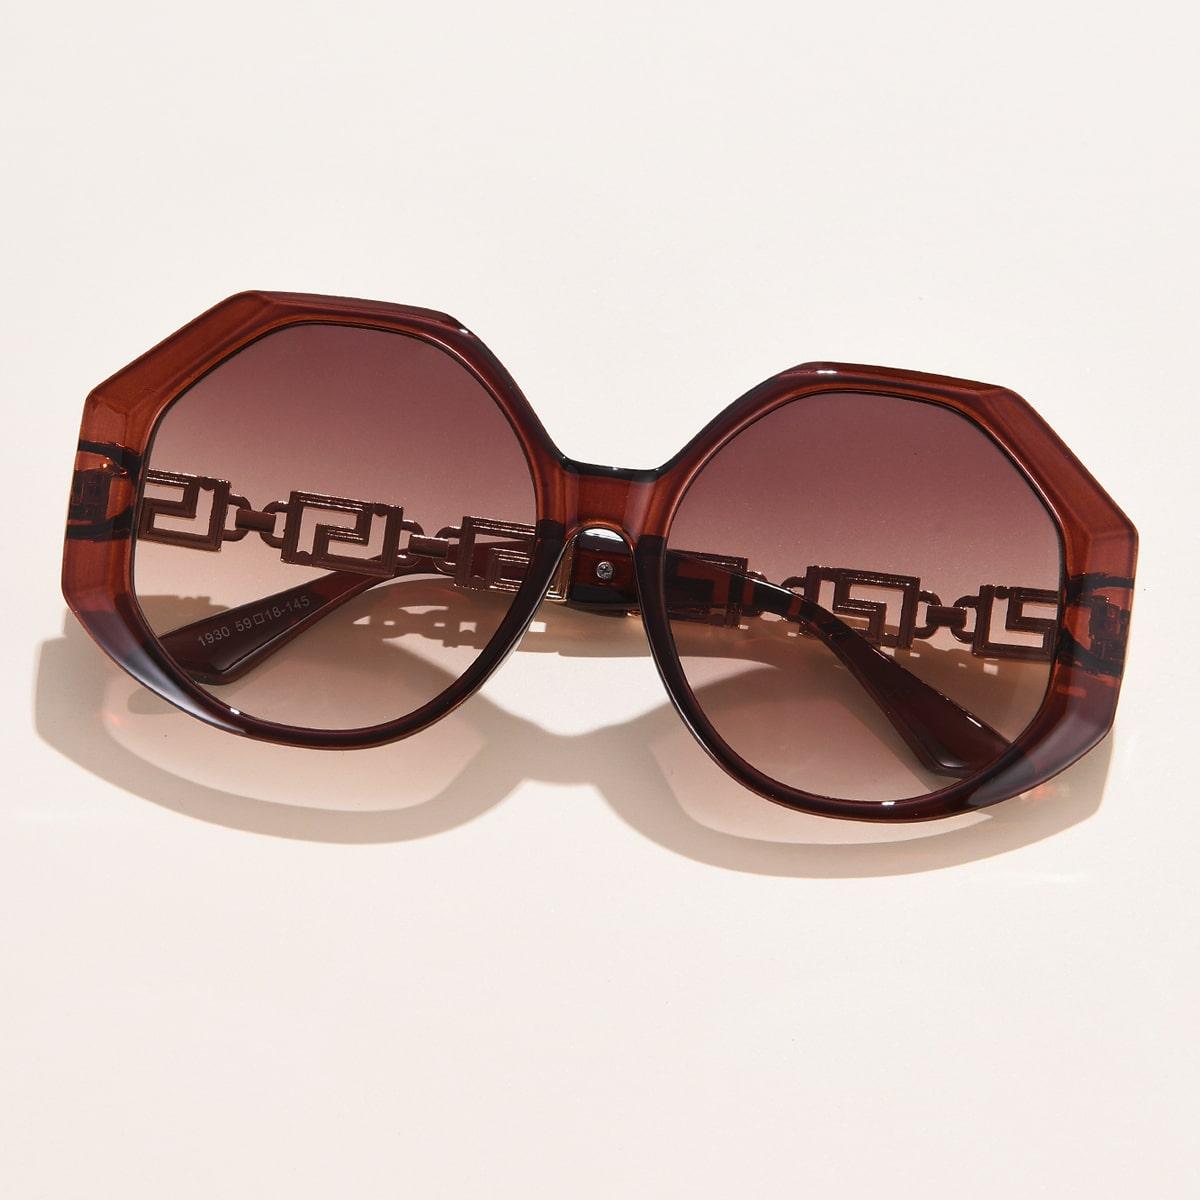 Geometric Design Sunglasses